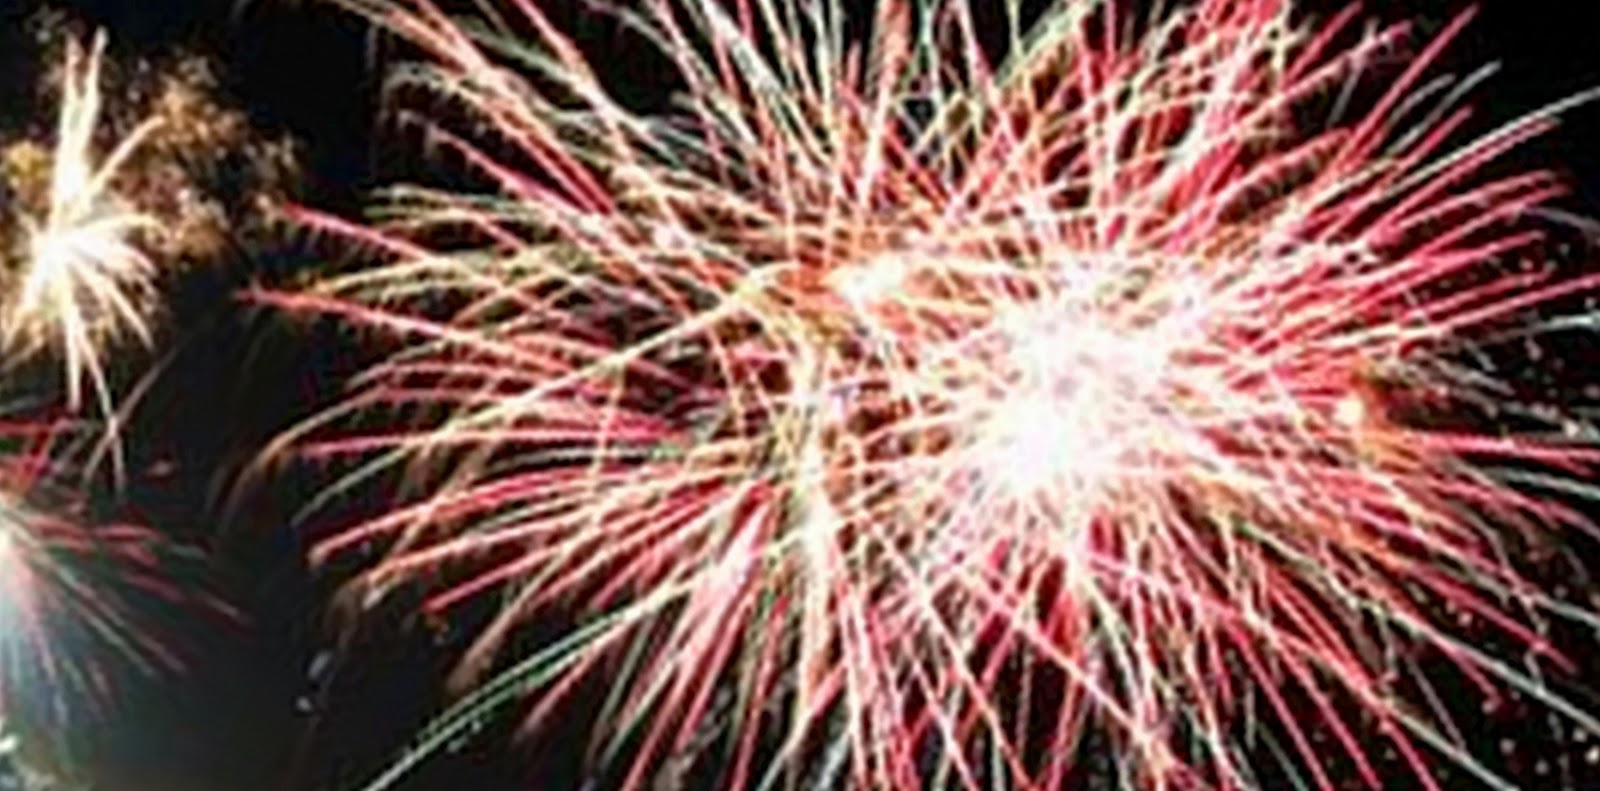 7 Kota dengan Perayaan Tahun Baru Paling Spektakuler di Dunia